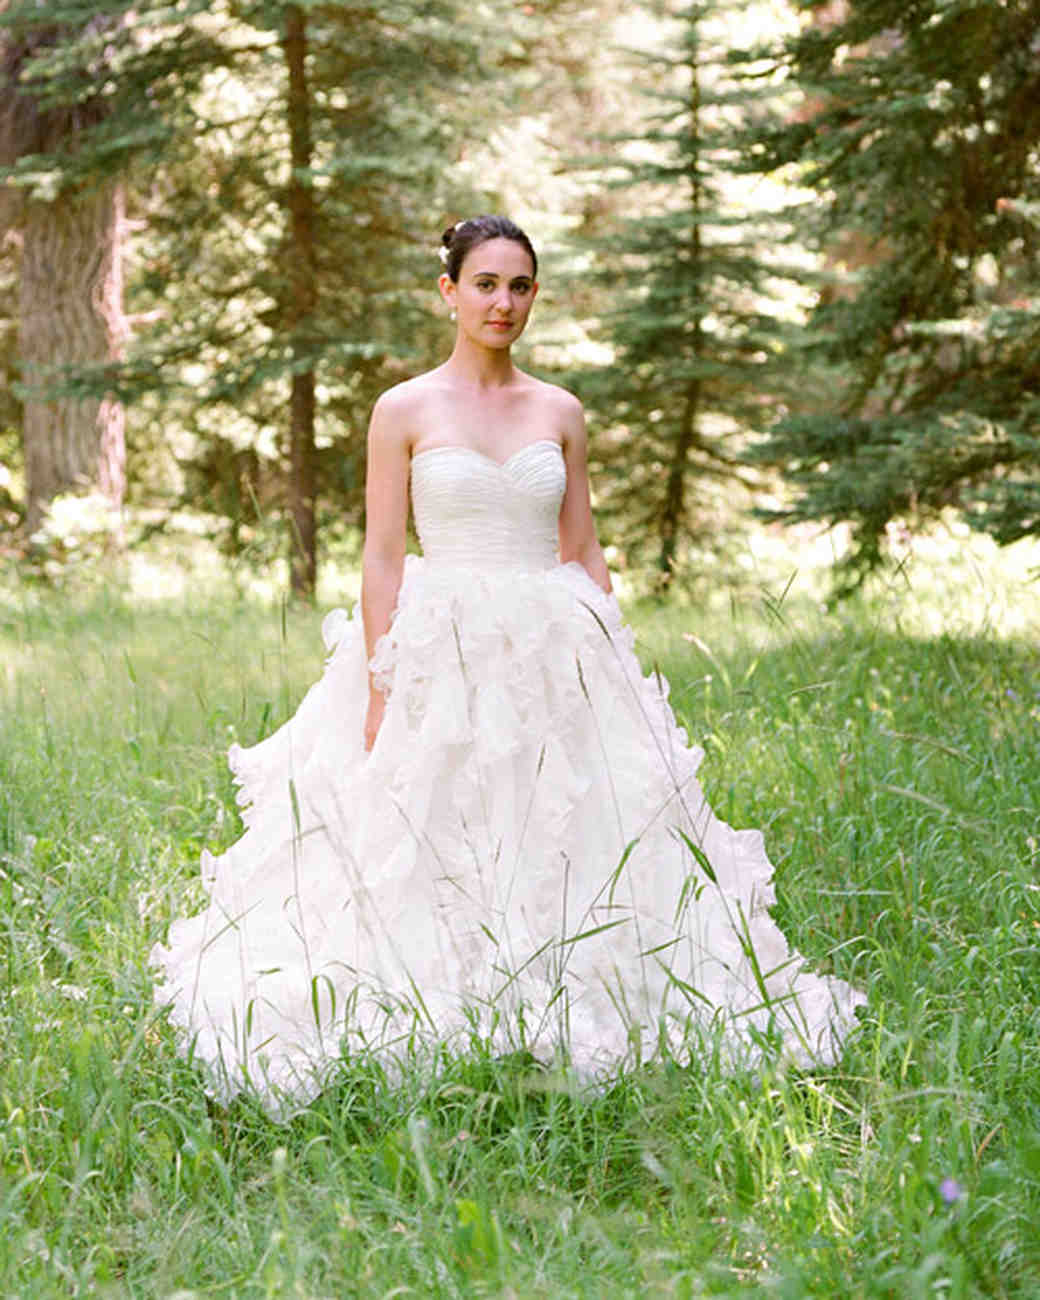 rw_0610_kristina_jesse_bridal.jpg